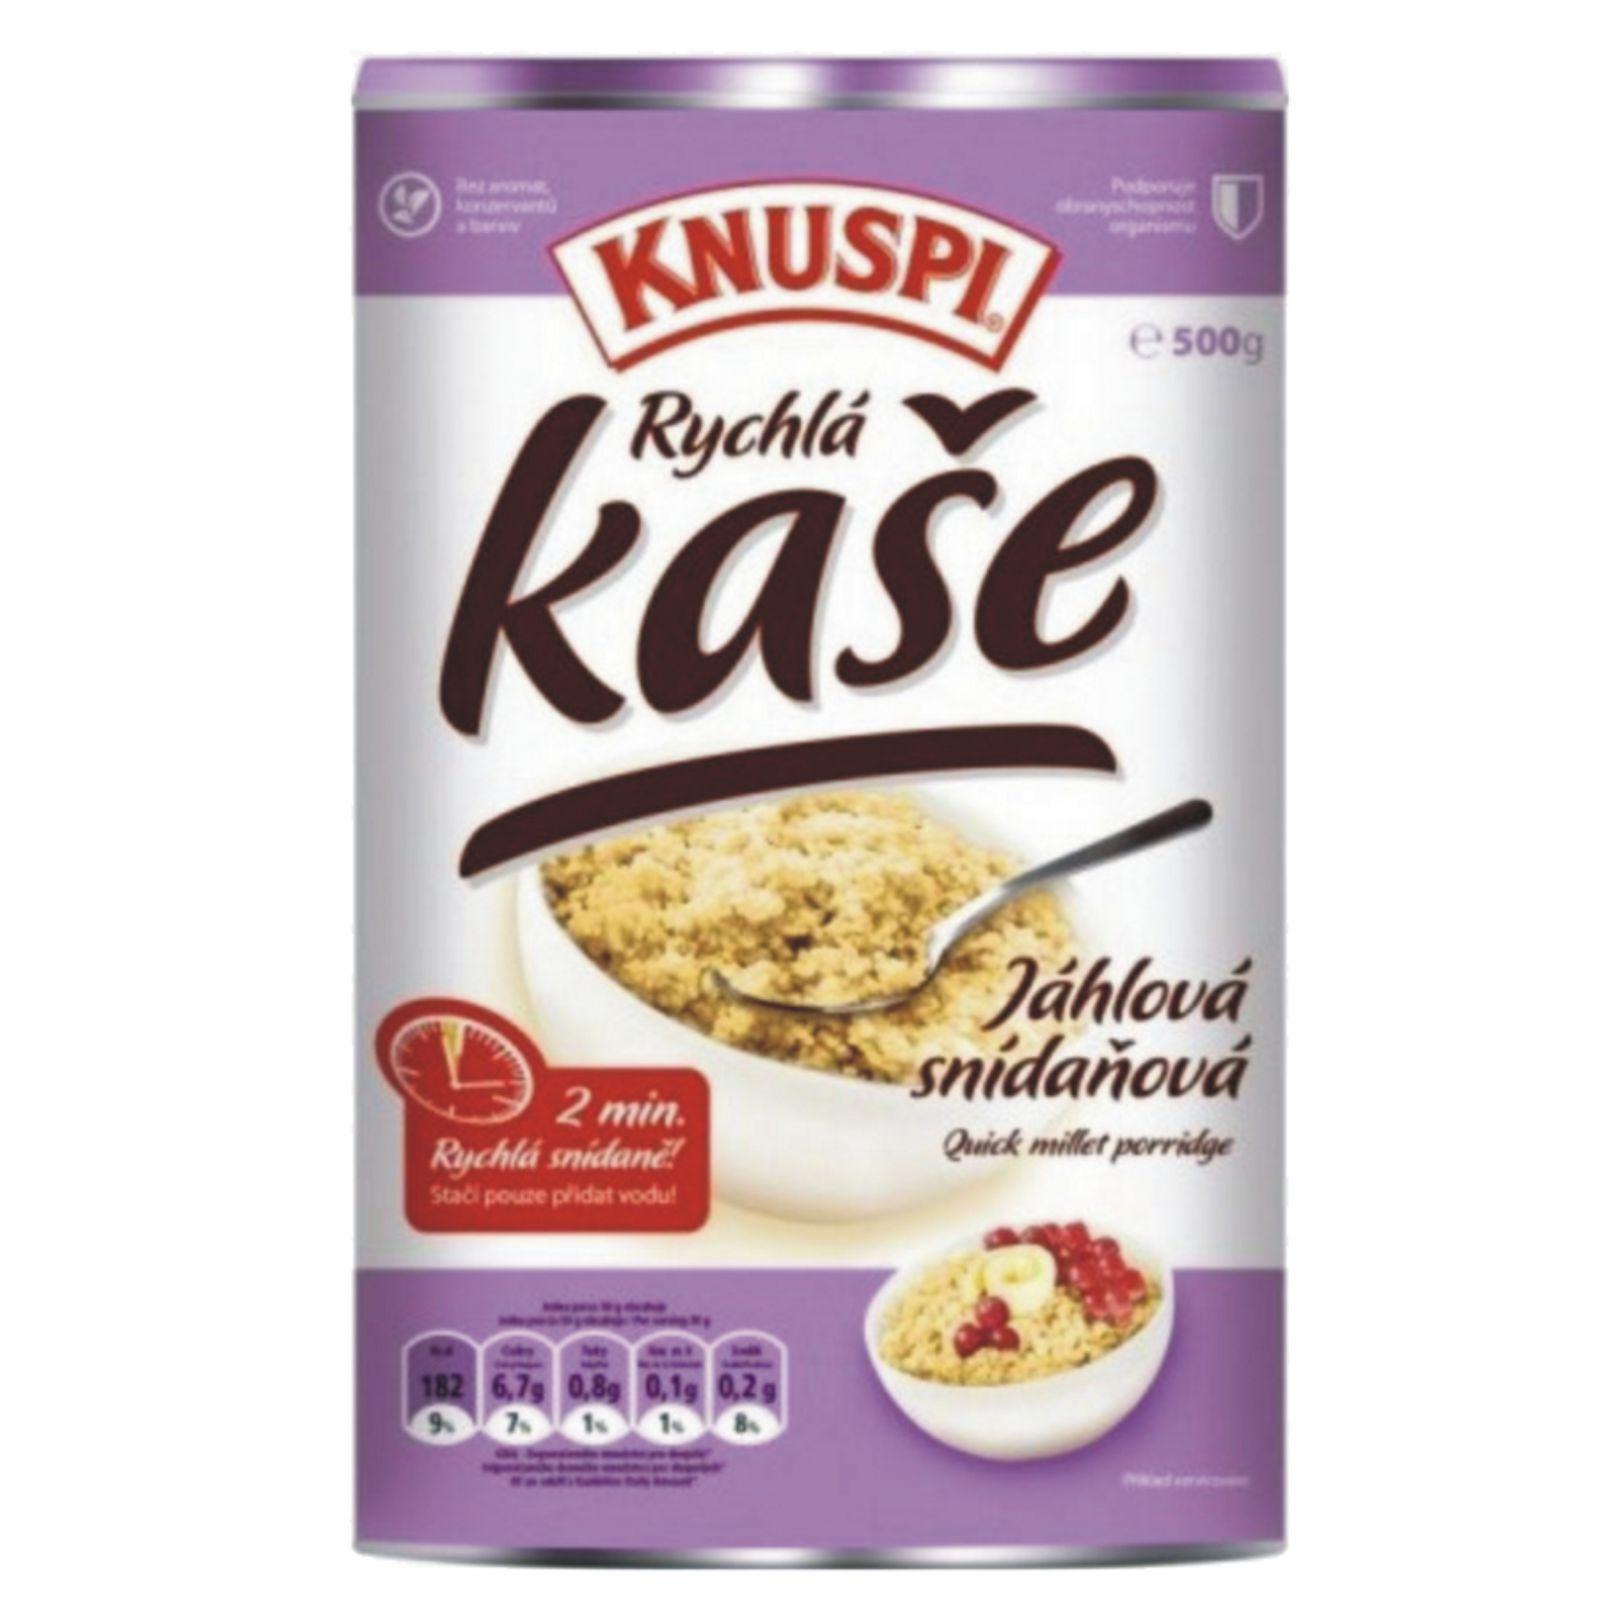 PROM-IN Knuspi Quick buckwheat porridge 500 g